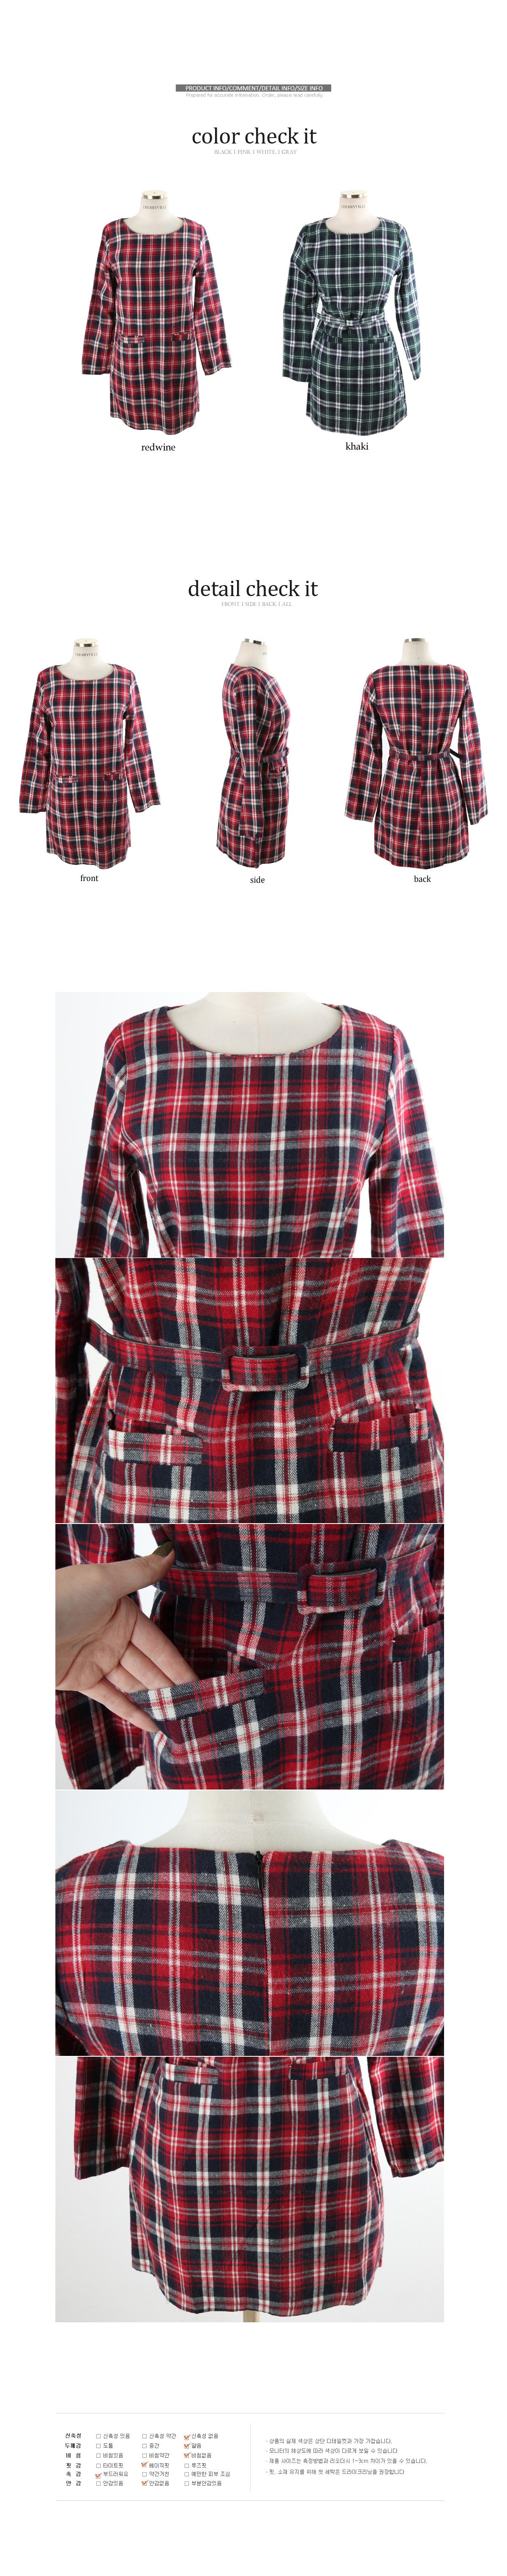 Levi's Check Dress + Belt Set